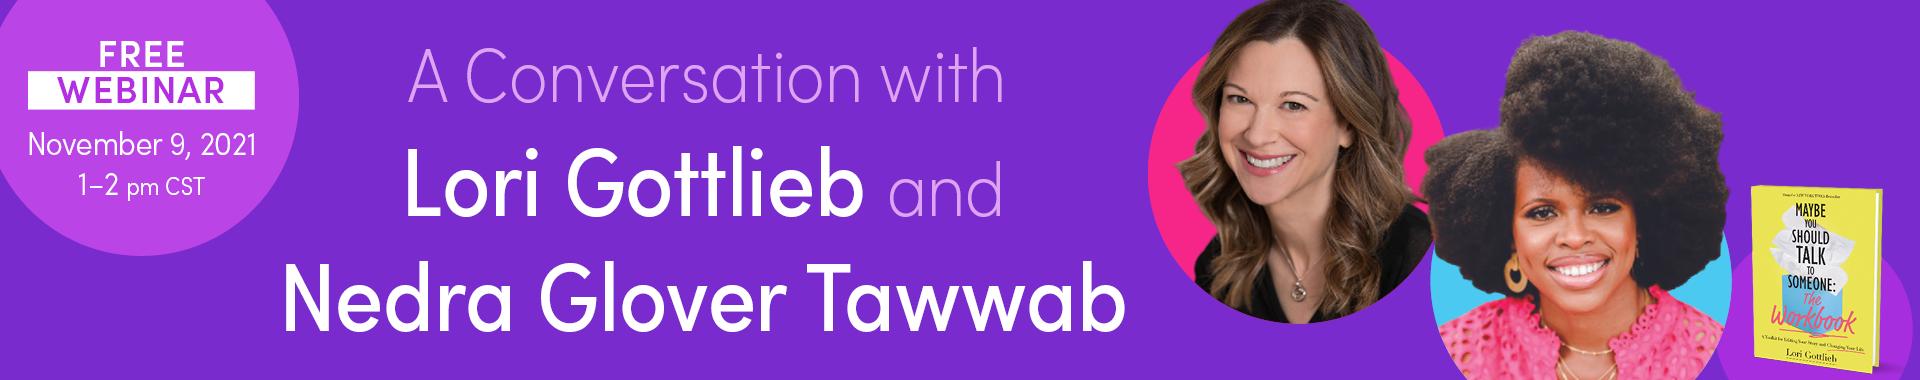 A Conversation with Lori Gottlieb & Nedra Tawwab Glover